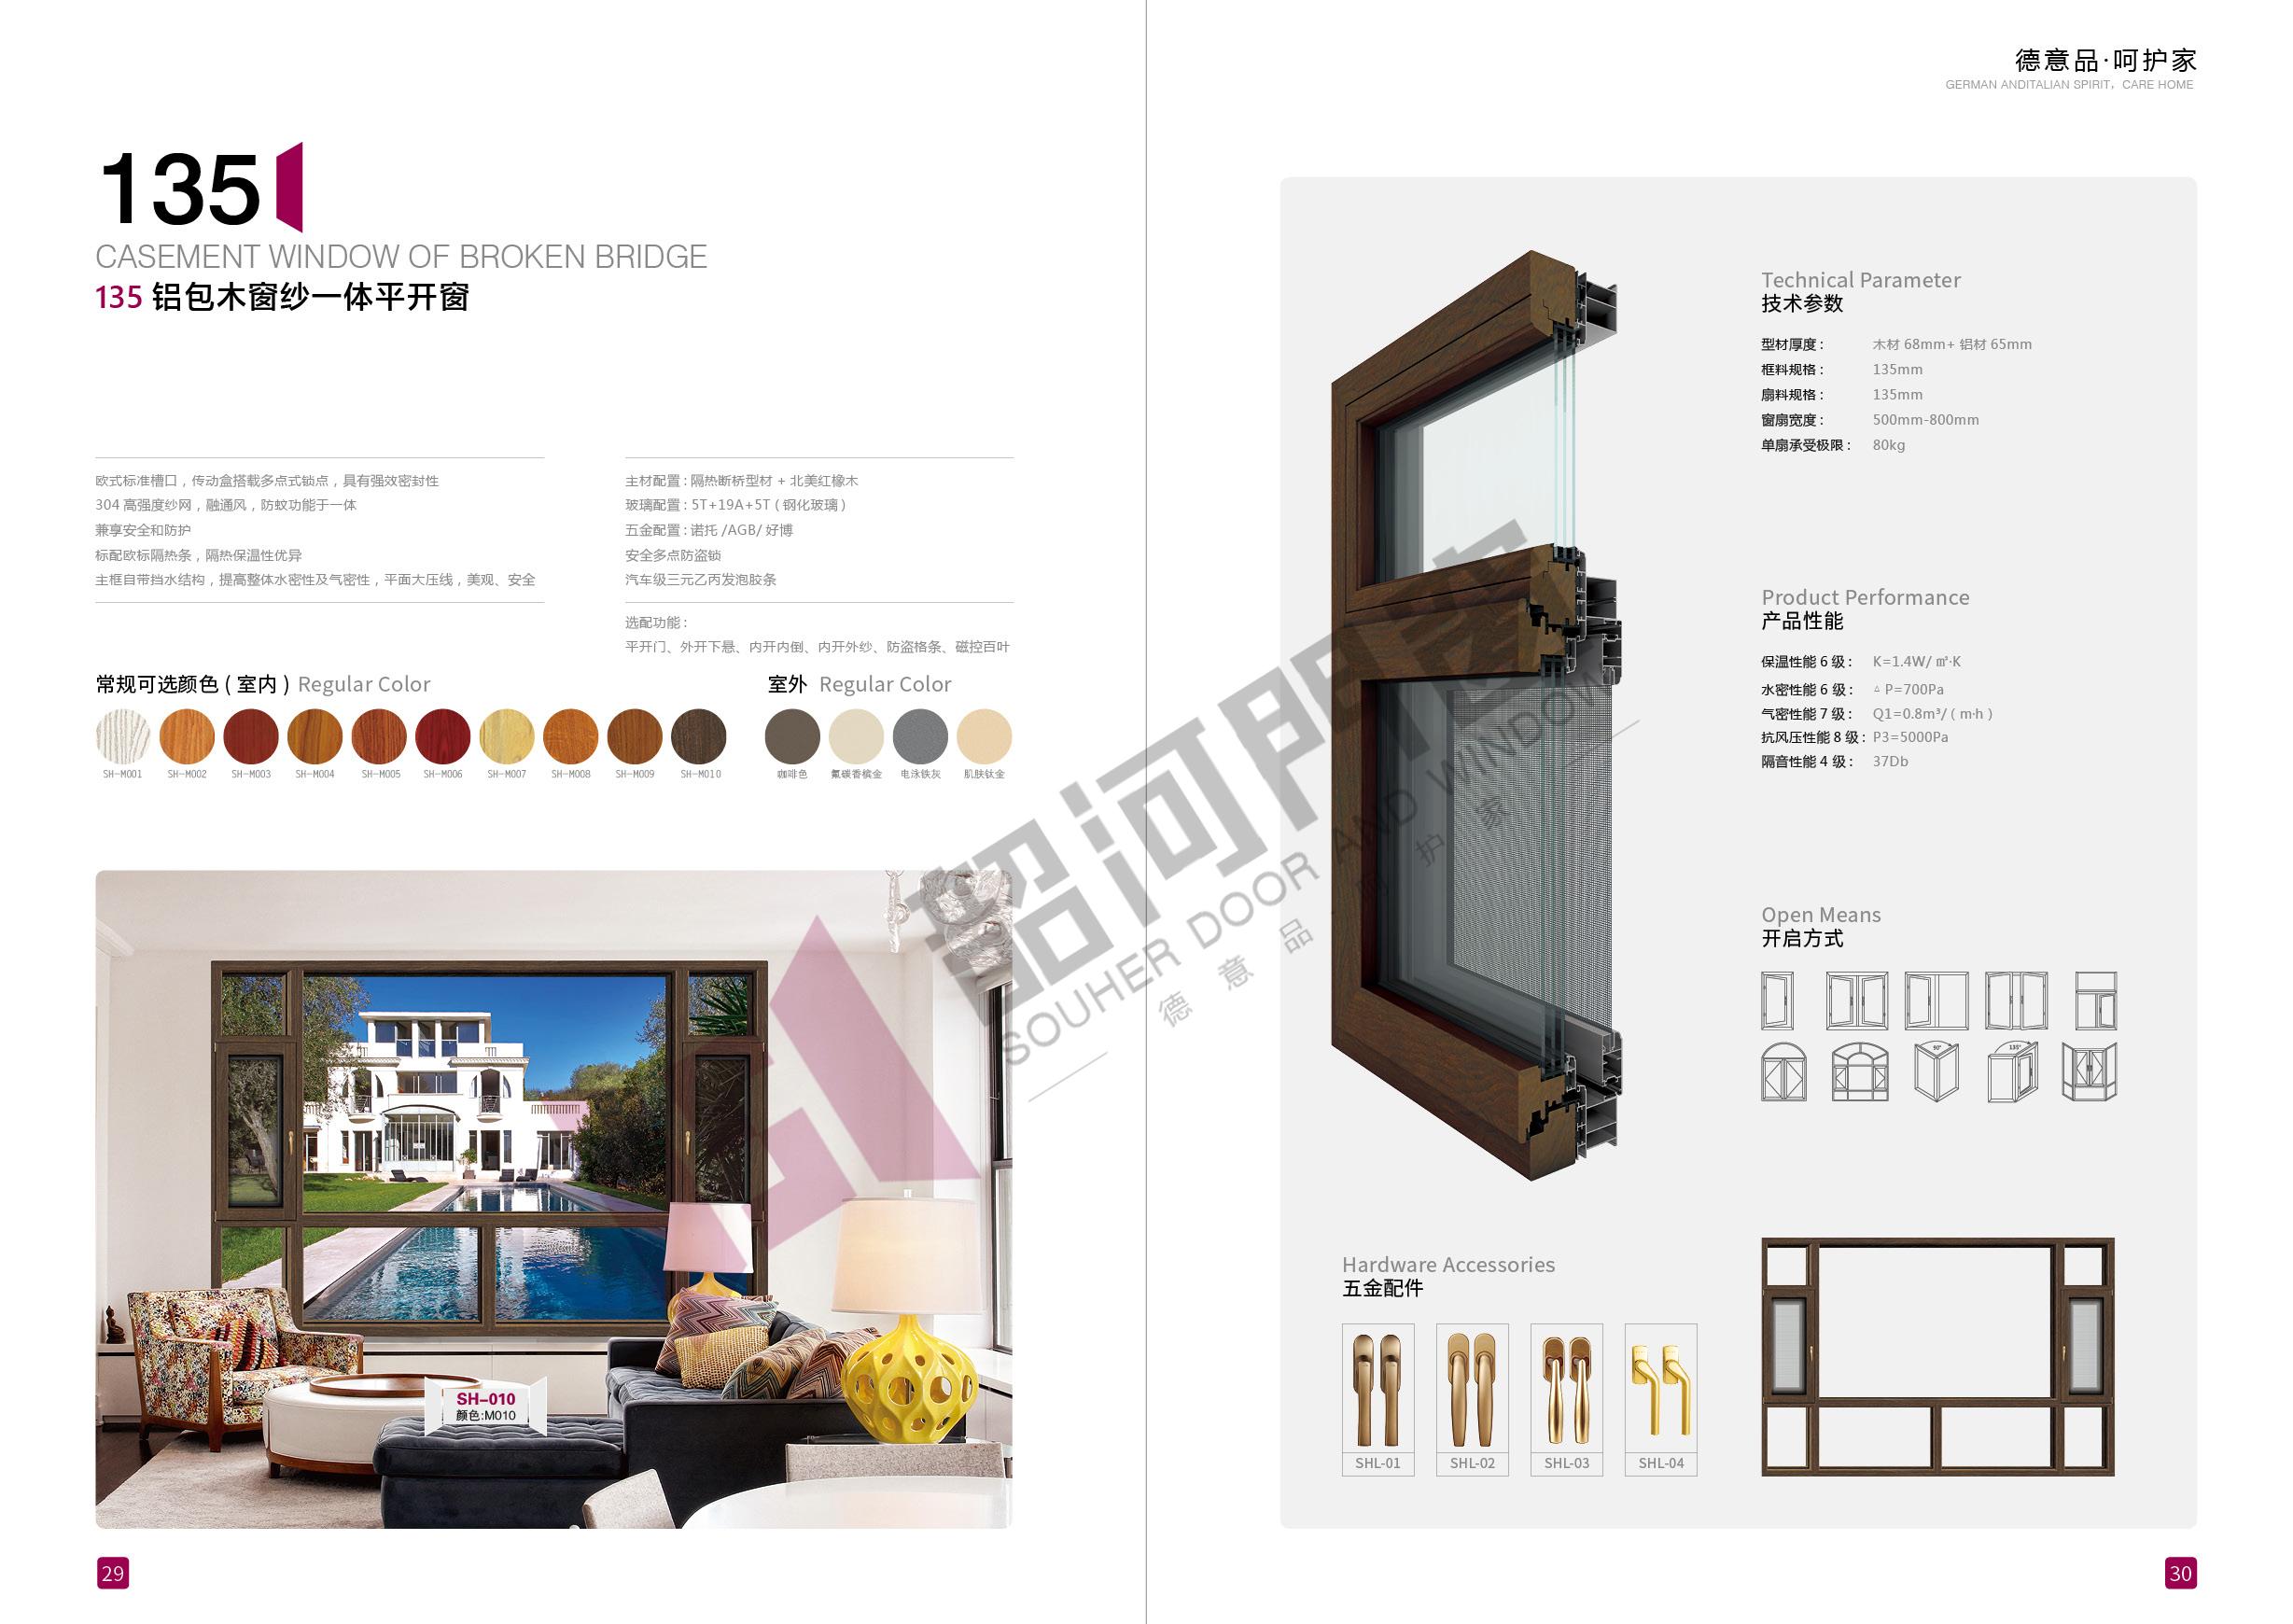 S 韶河门窗 排版 016